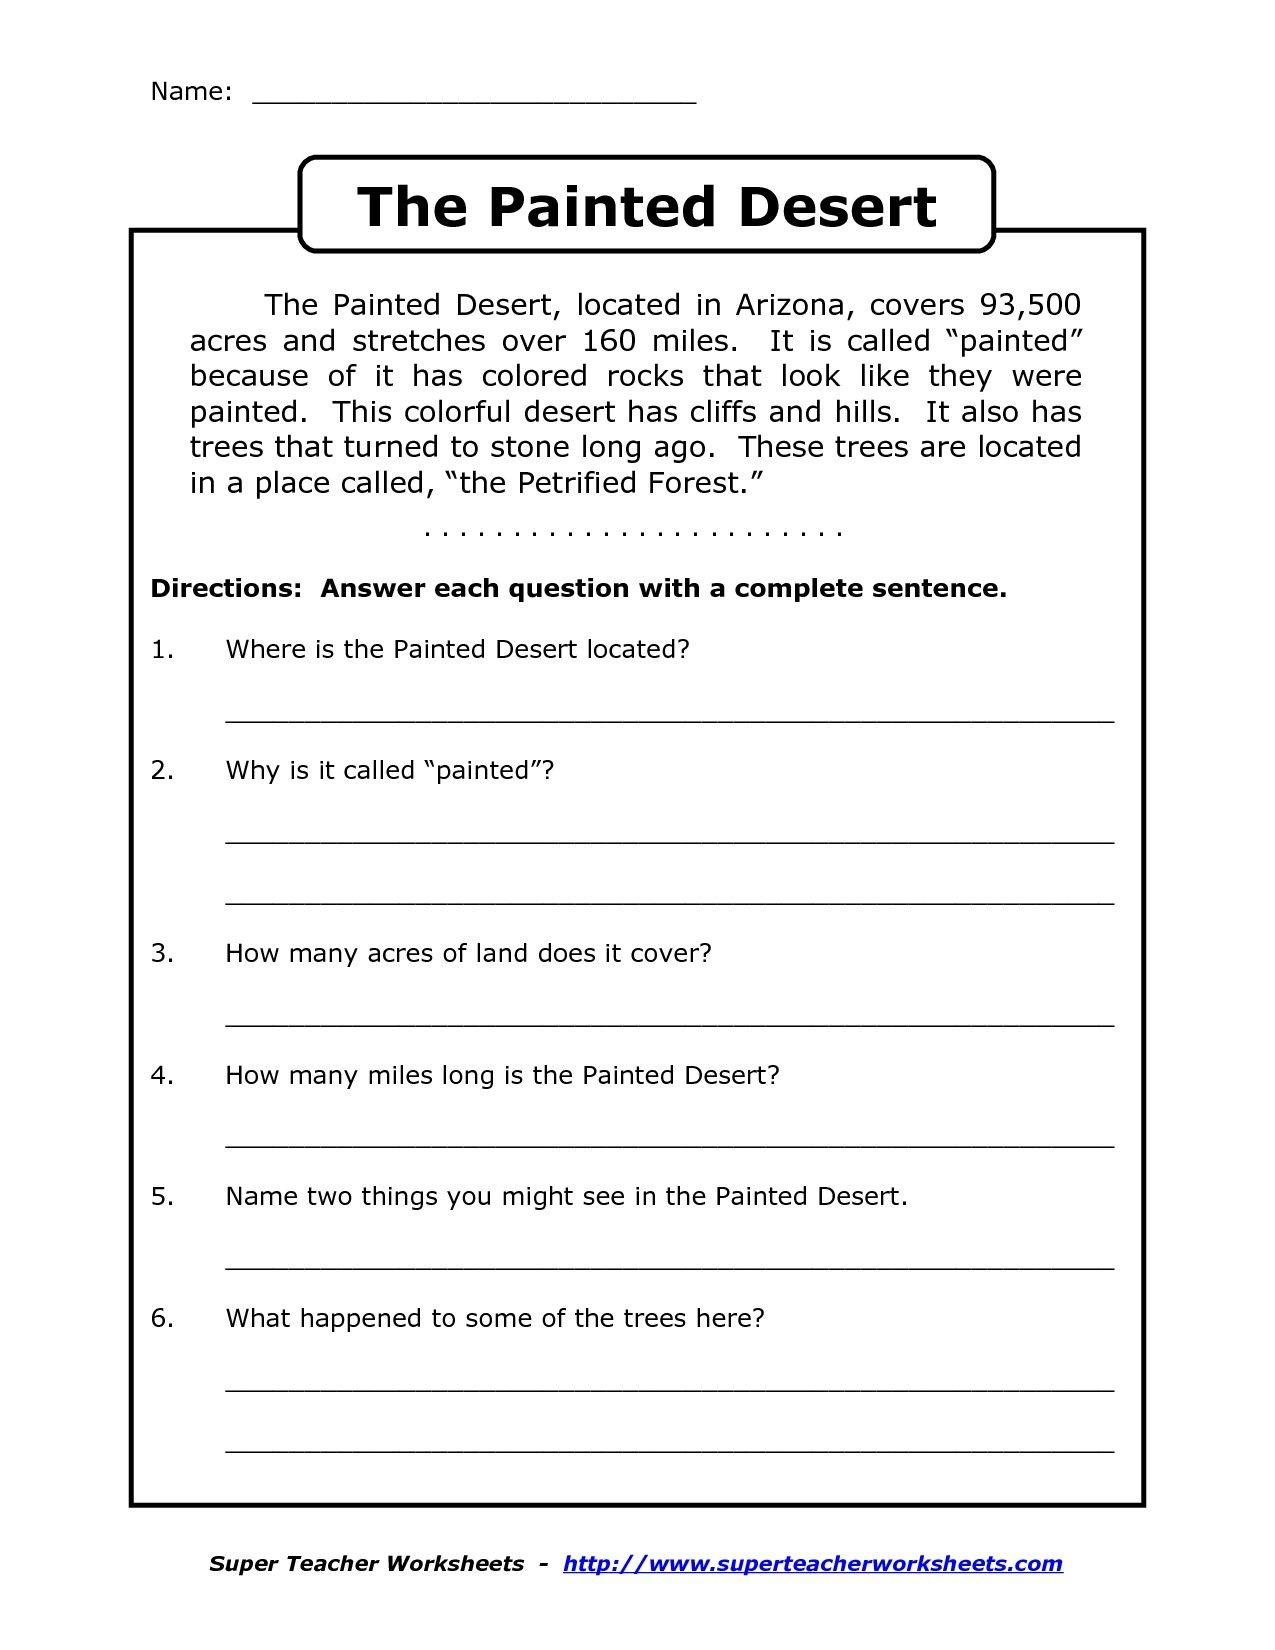 Image Result For Free Printable Worksheets For Grade 4 Comprehension - Free Printable Reading Comprehension Worksheets For 3Rd Grade